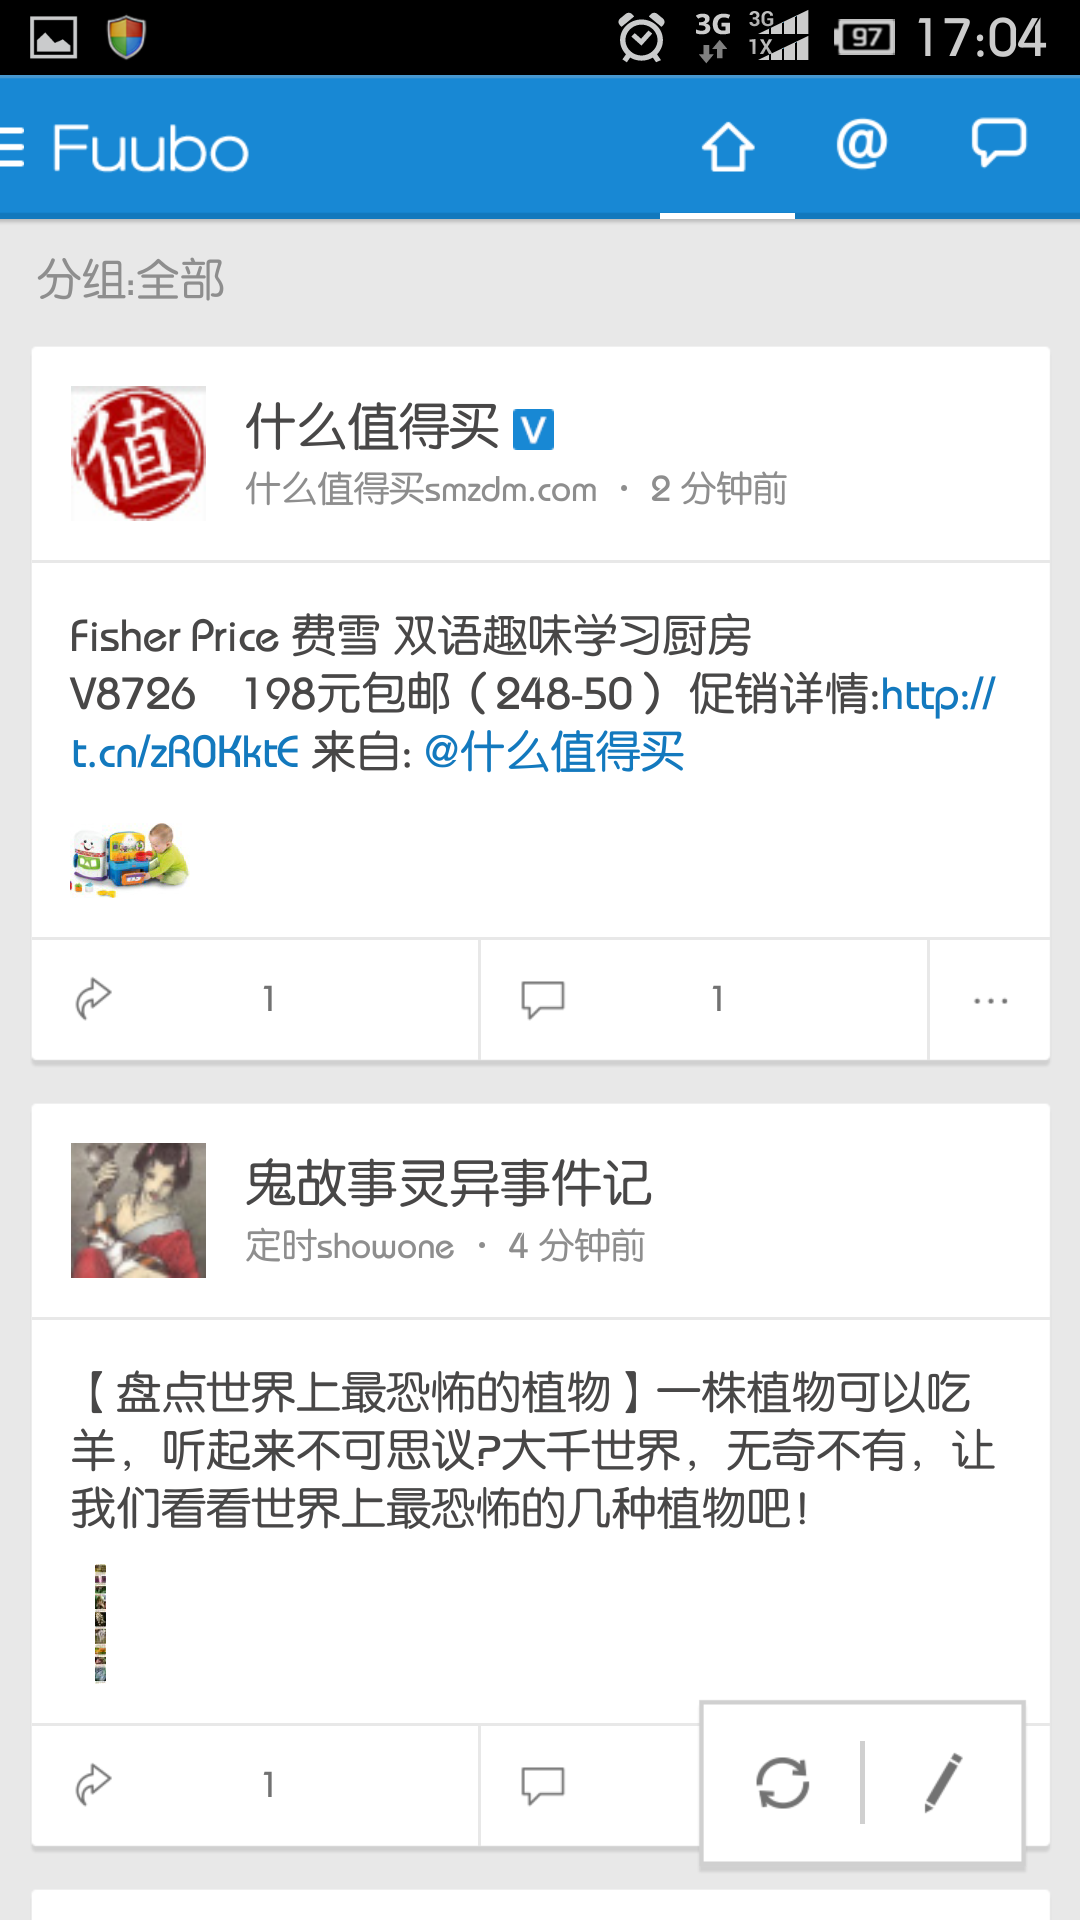 Screenshot_2013-11-05-17-04-43.png